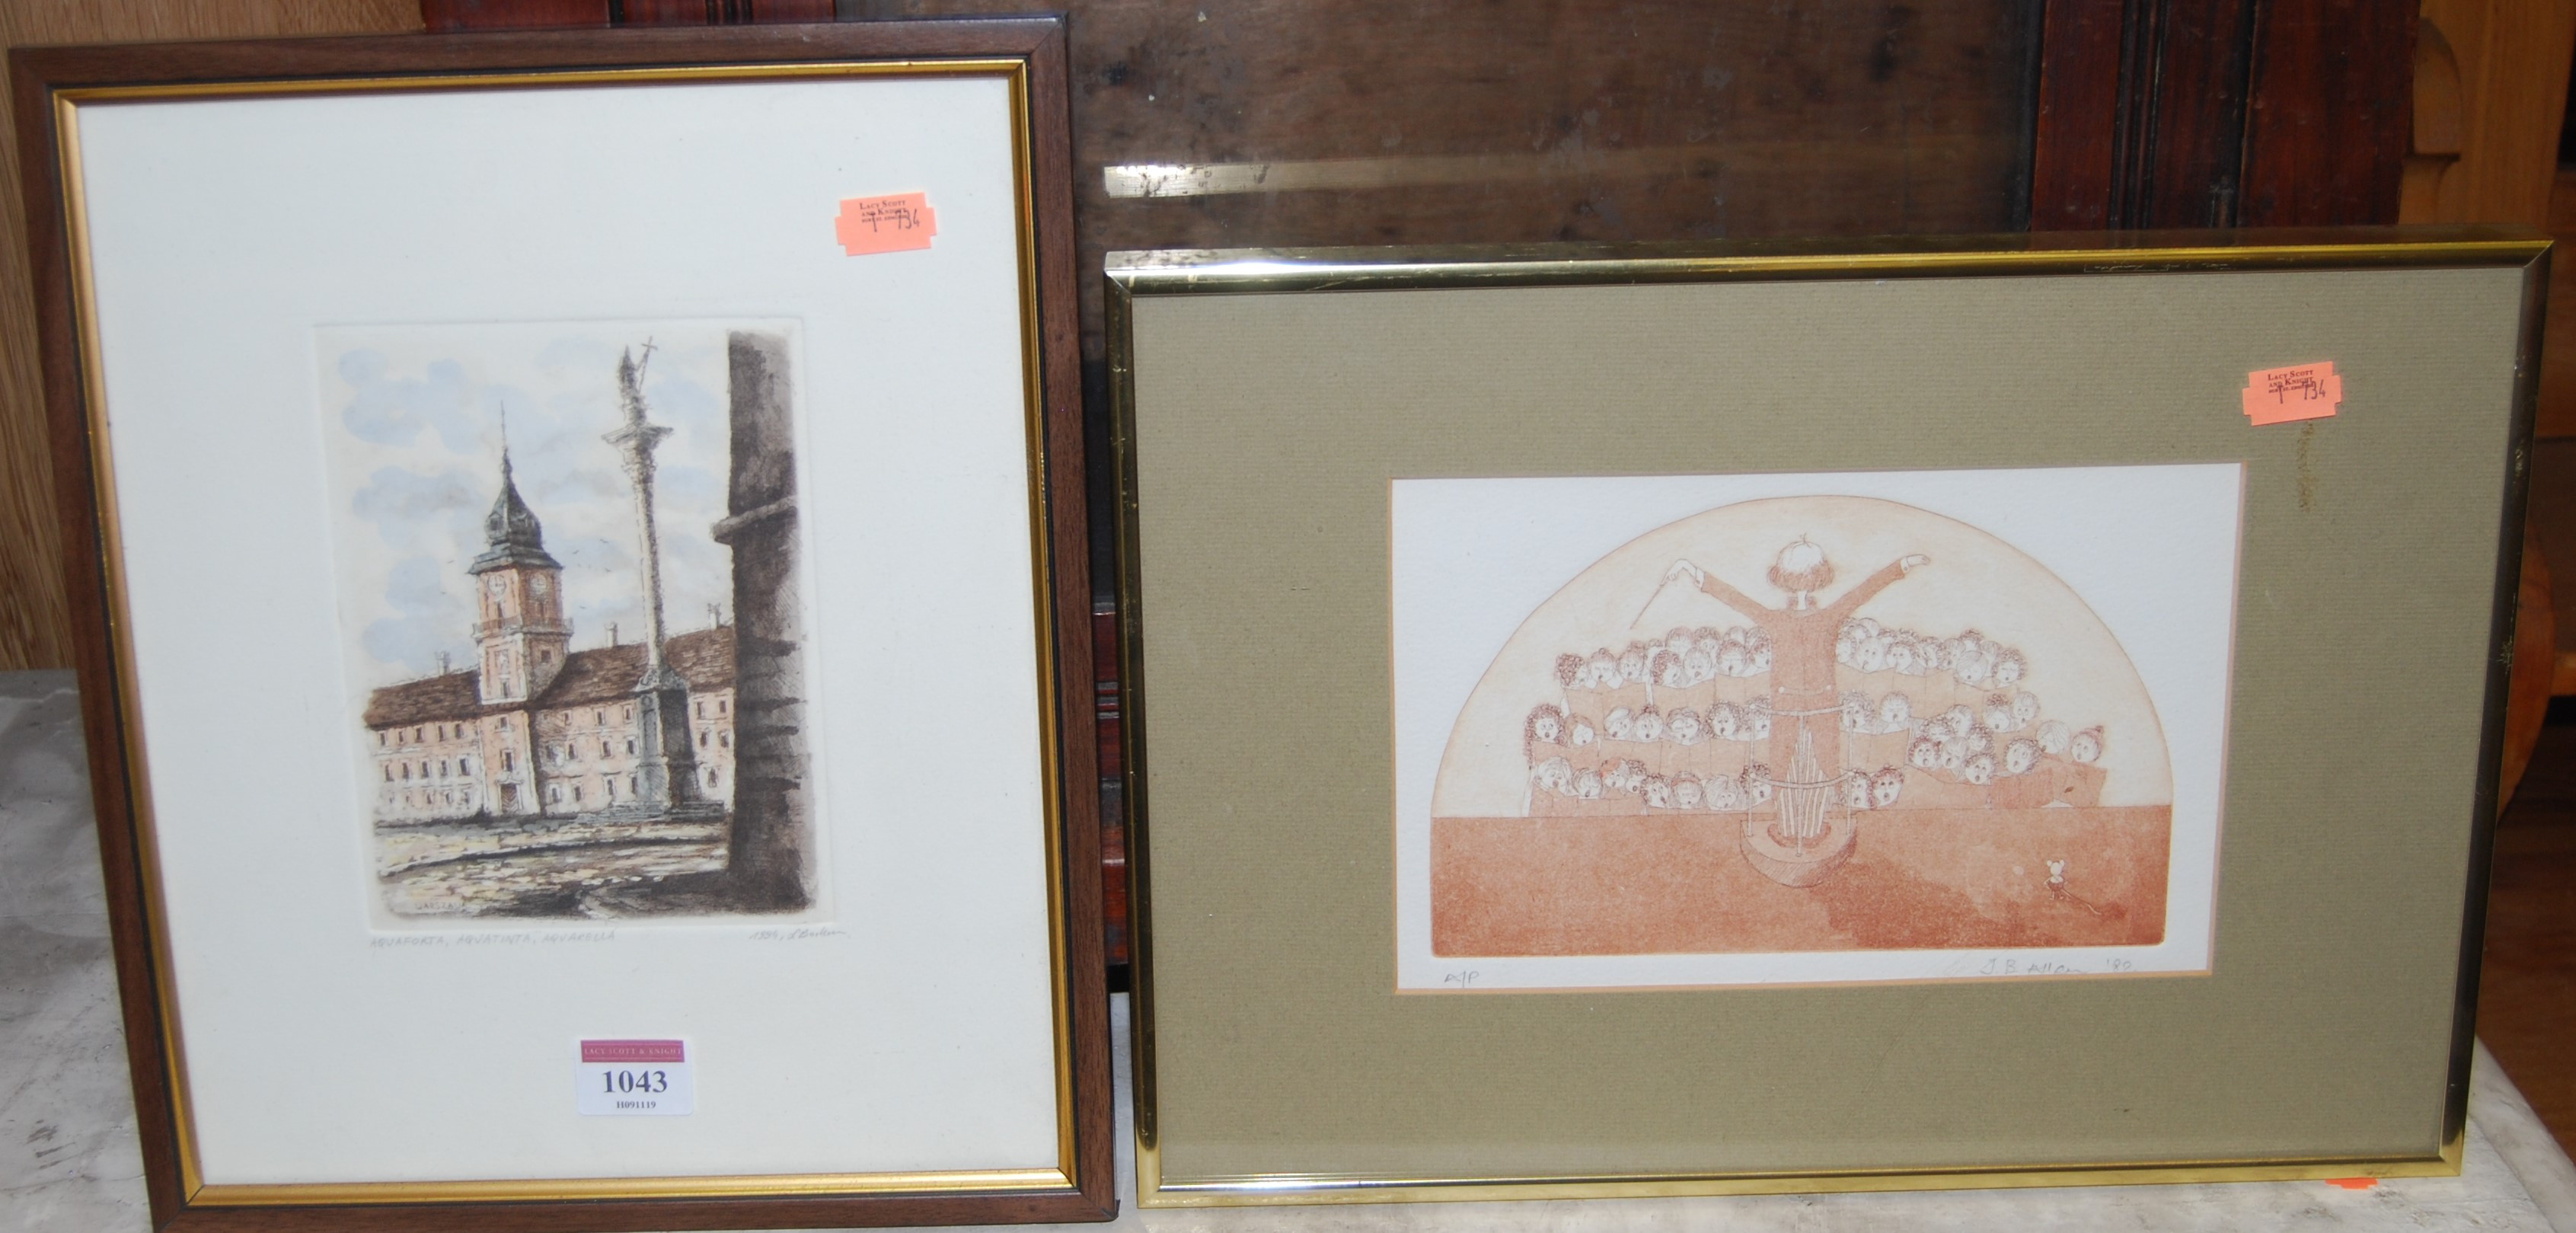 Lot 1043 - Gwen Webb - Poppies in a wheat field, screenprint; Catherine Cool - Chloe, artists proof print; J.B.